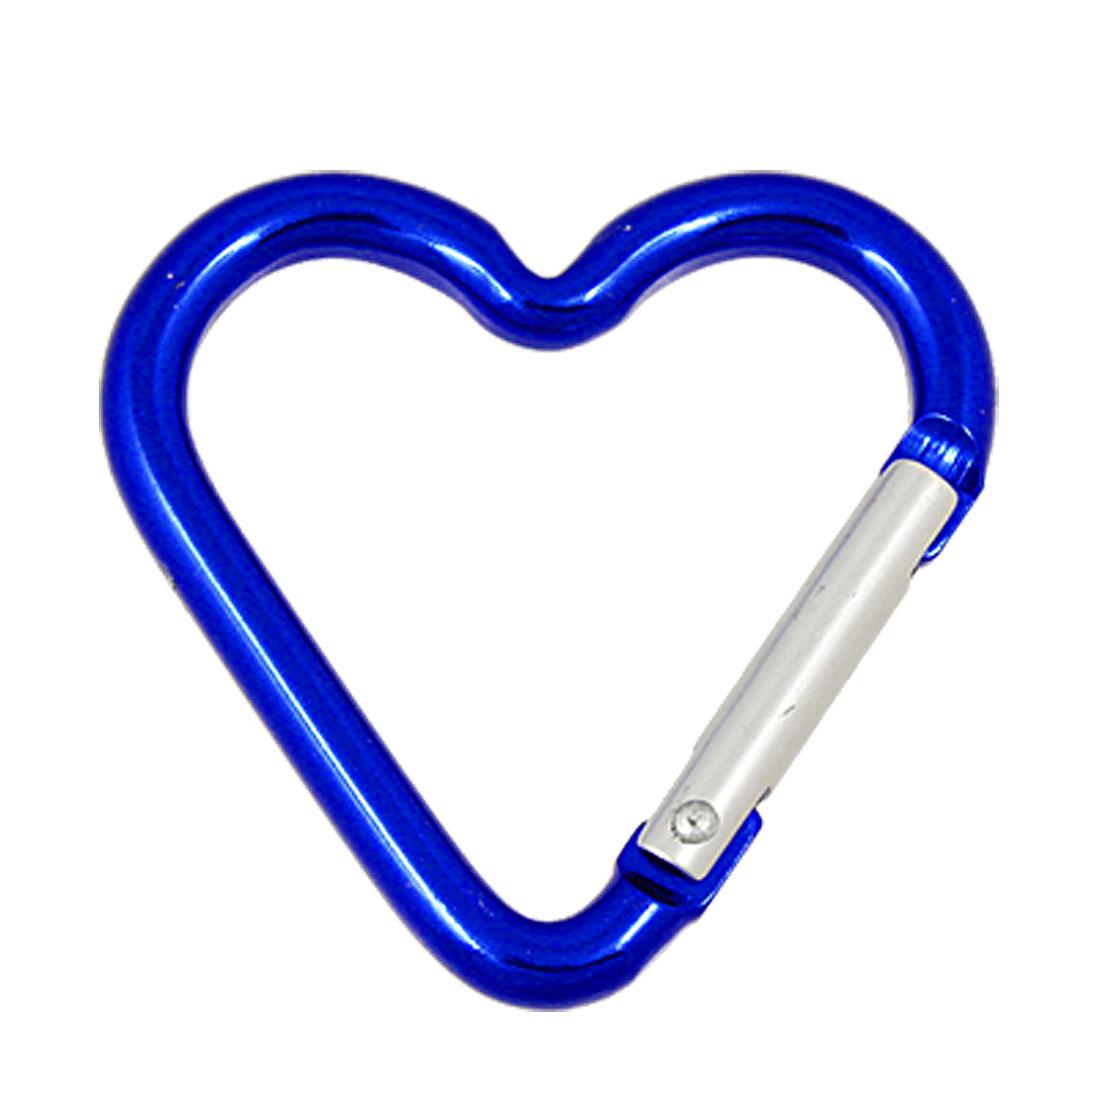 Aluminum Heart Shape Silver Tone Spring Loaded Gate Blue Carabiner Hook